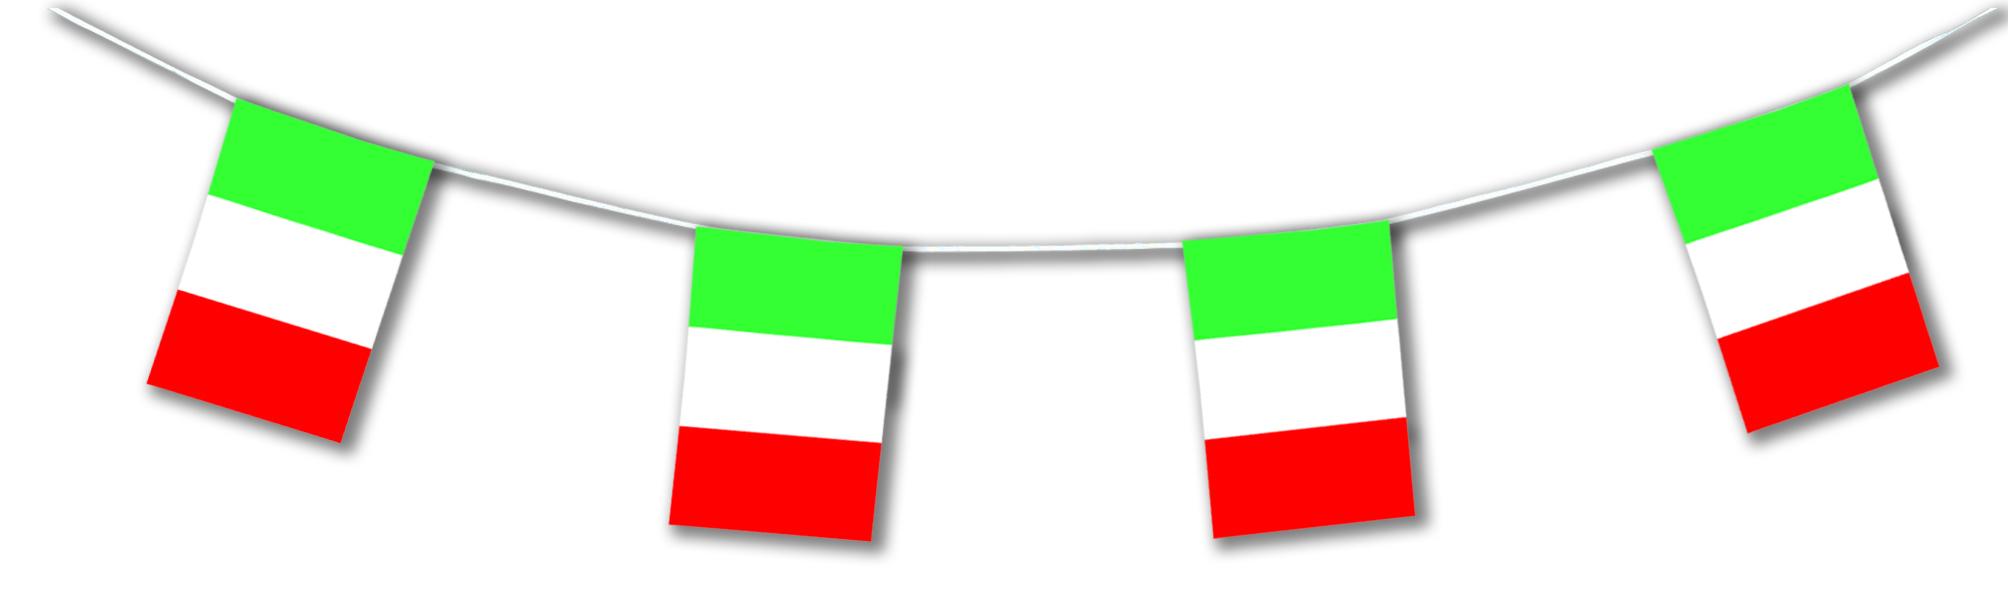 guirlande fanions drapeaux italie